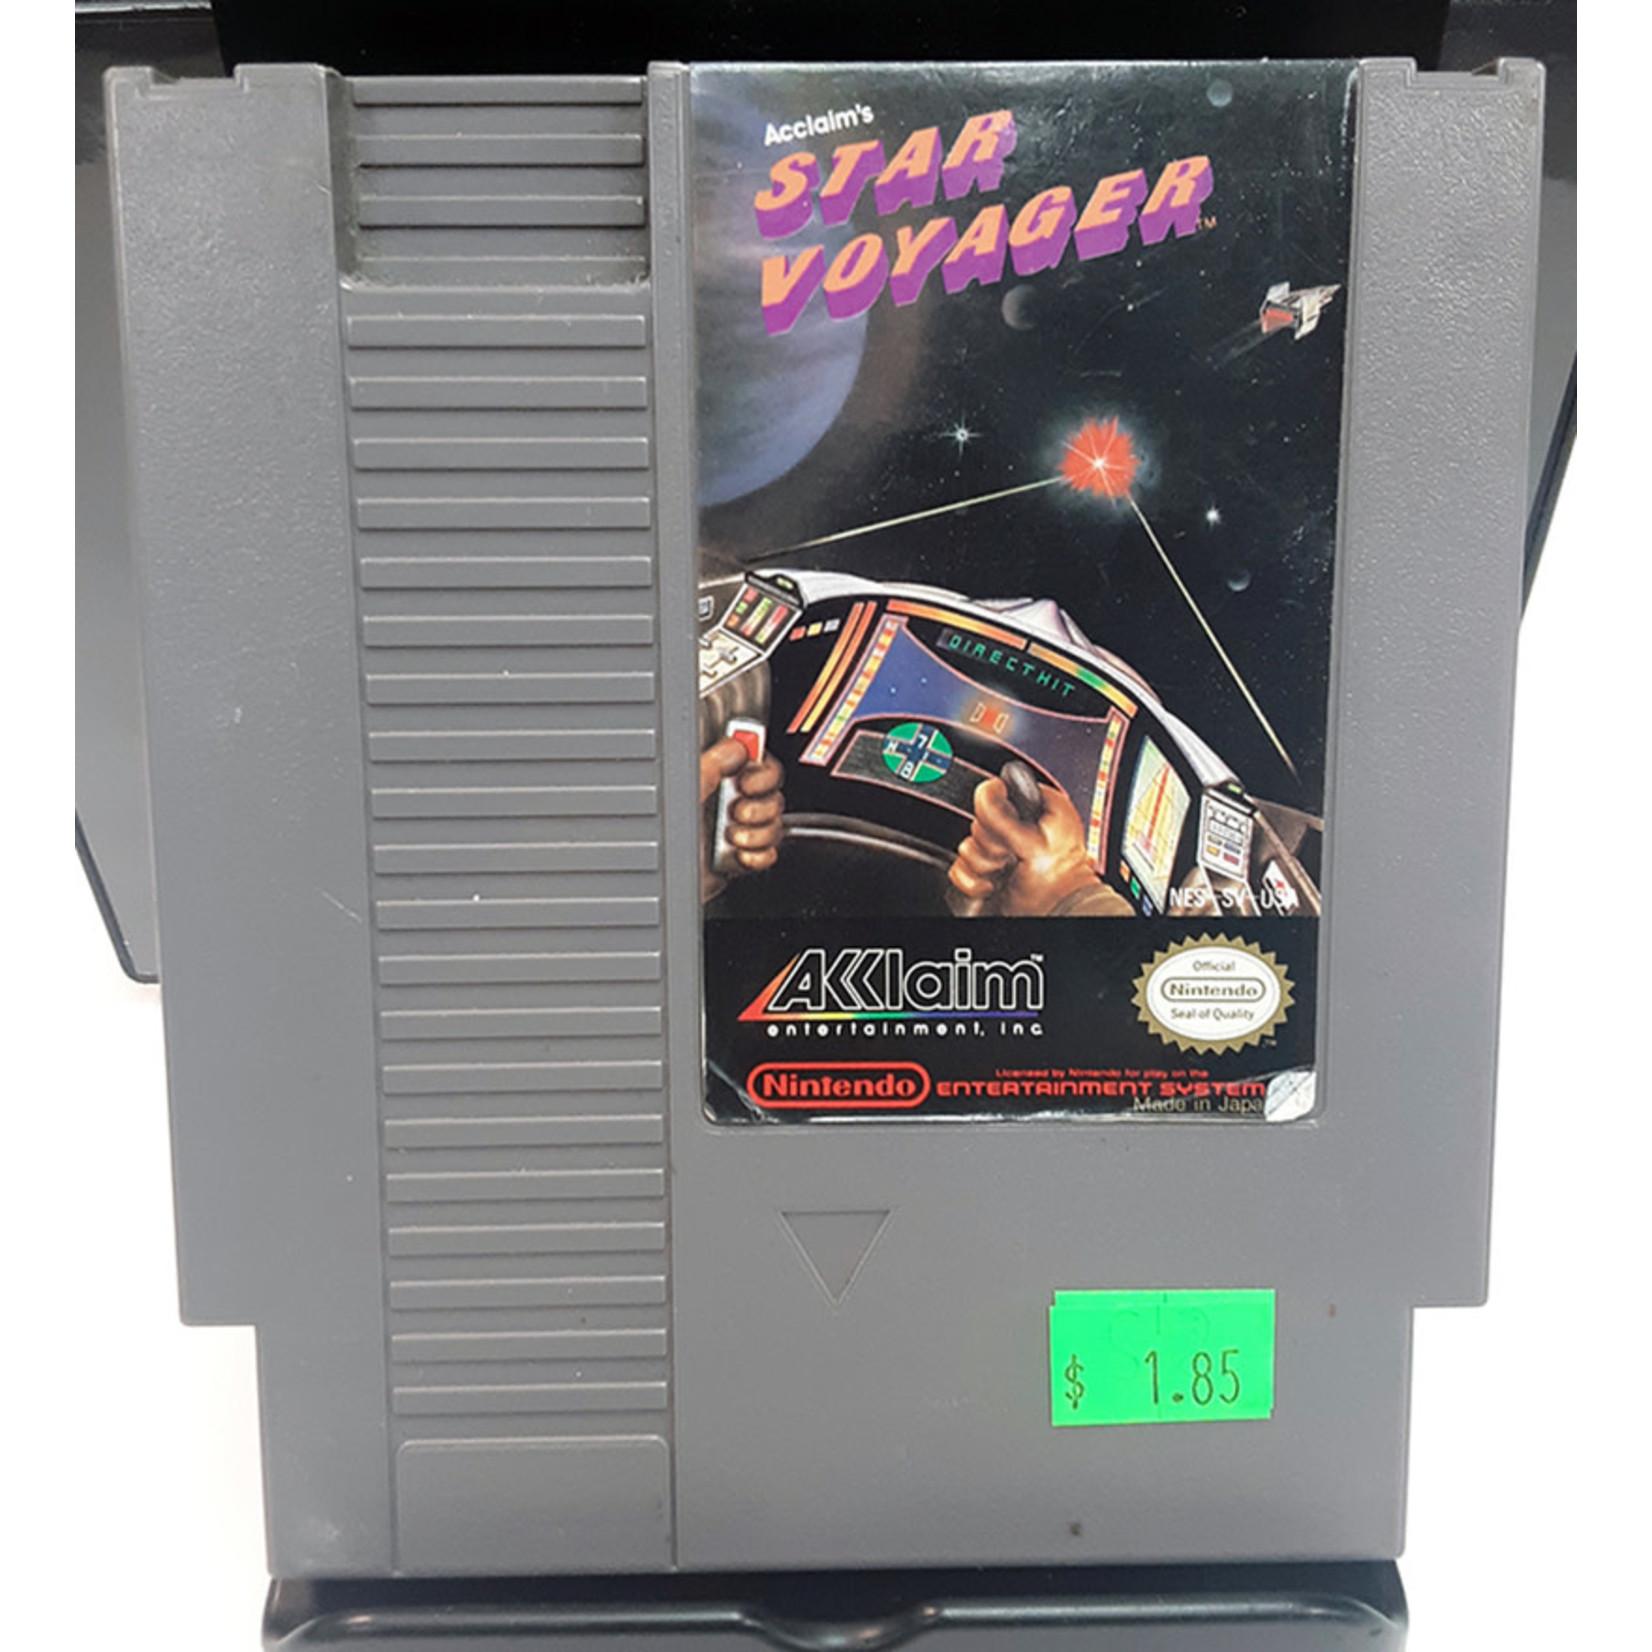 NESU-STAR VOYAGER (cartridge)